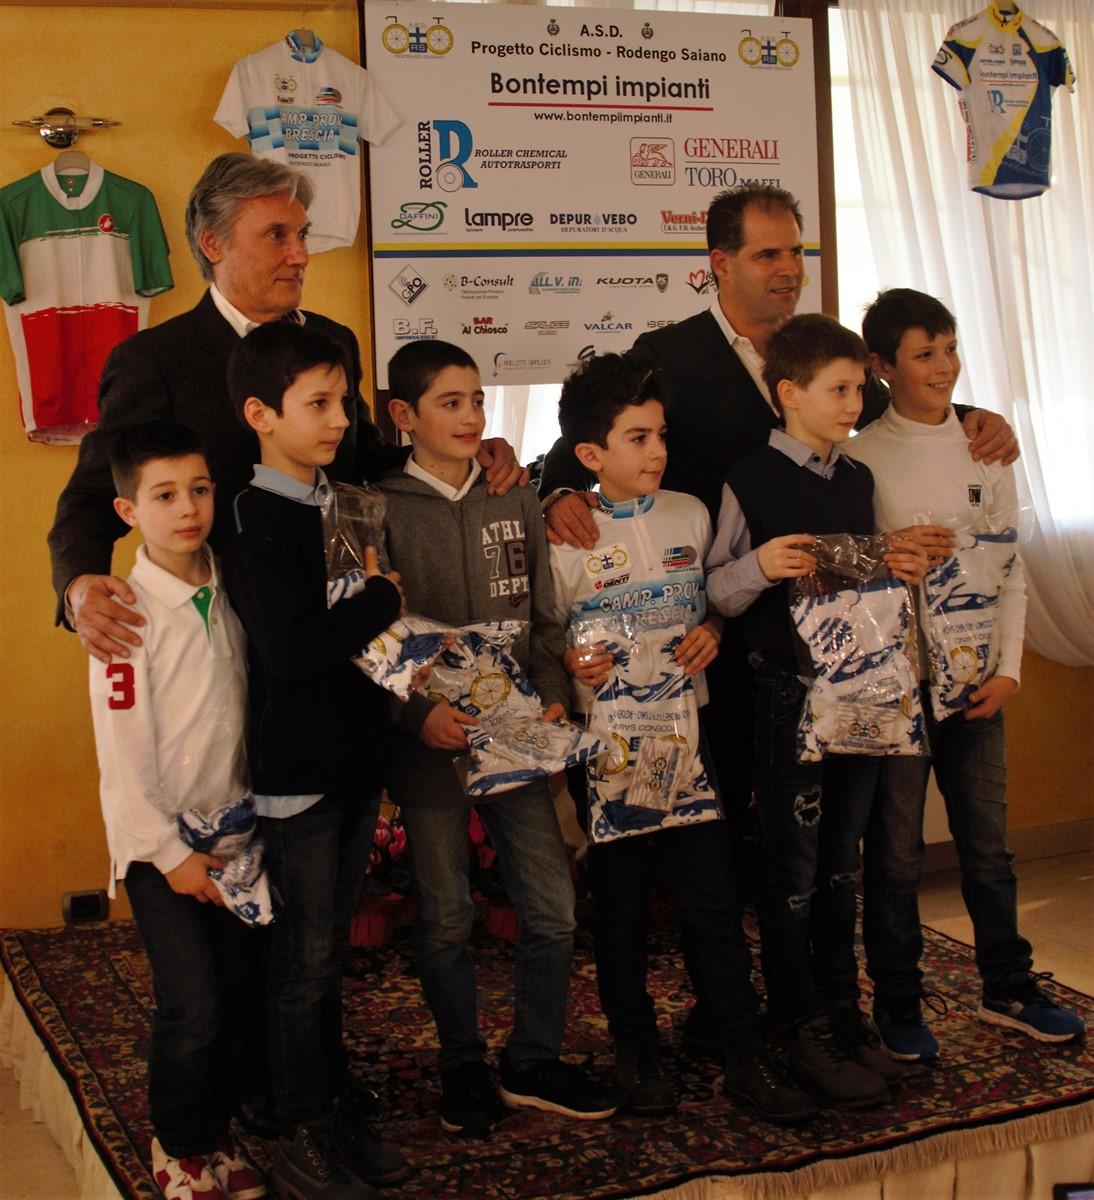 Saronni premia i Giovanissimi G4